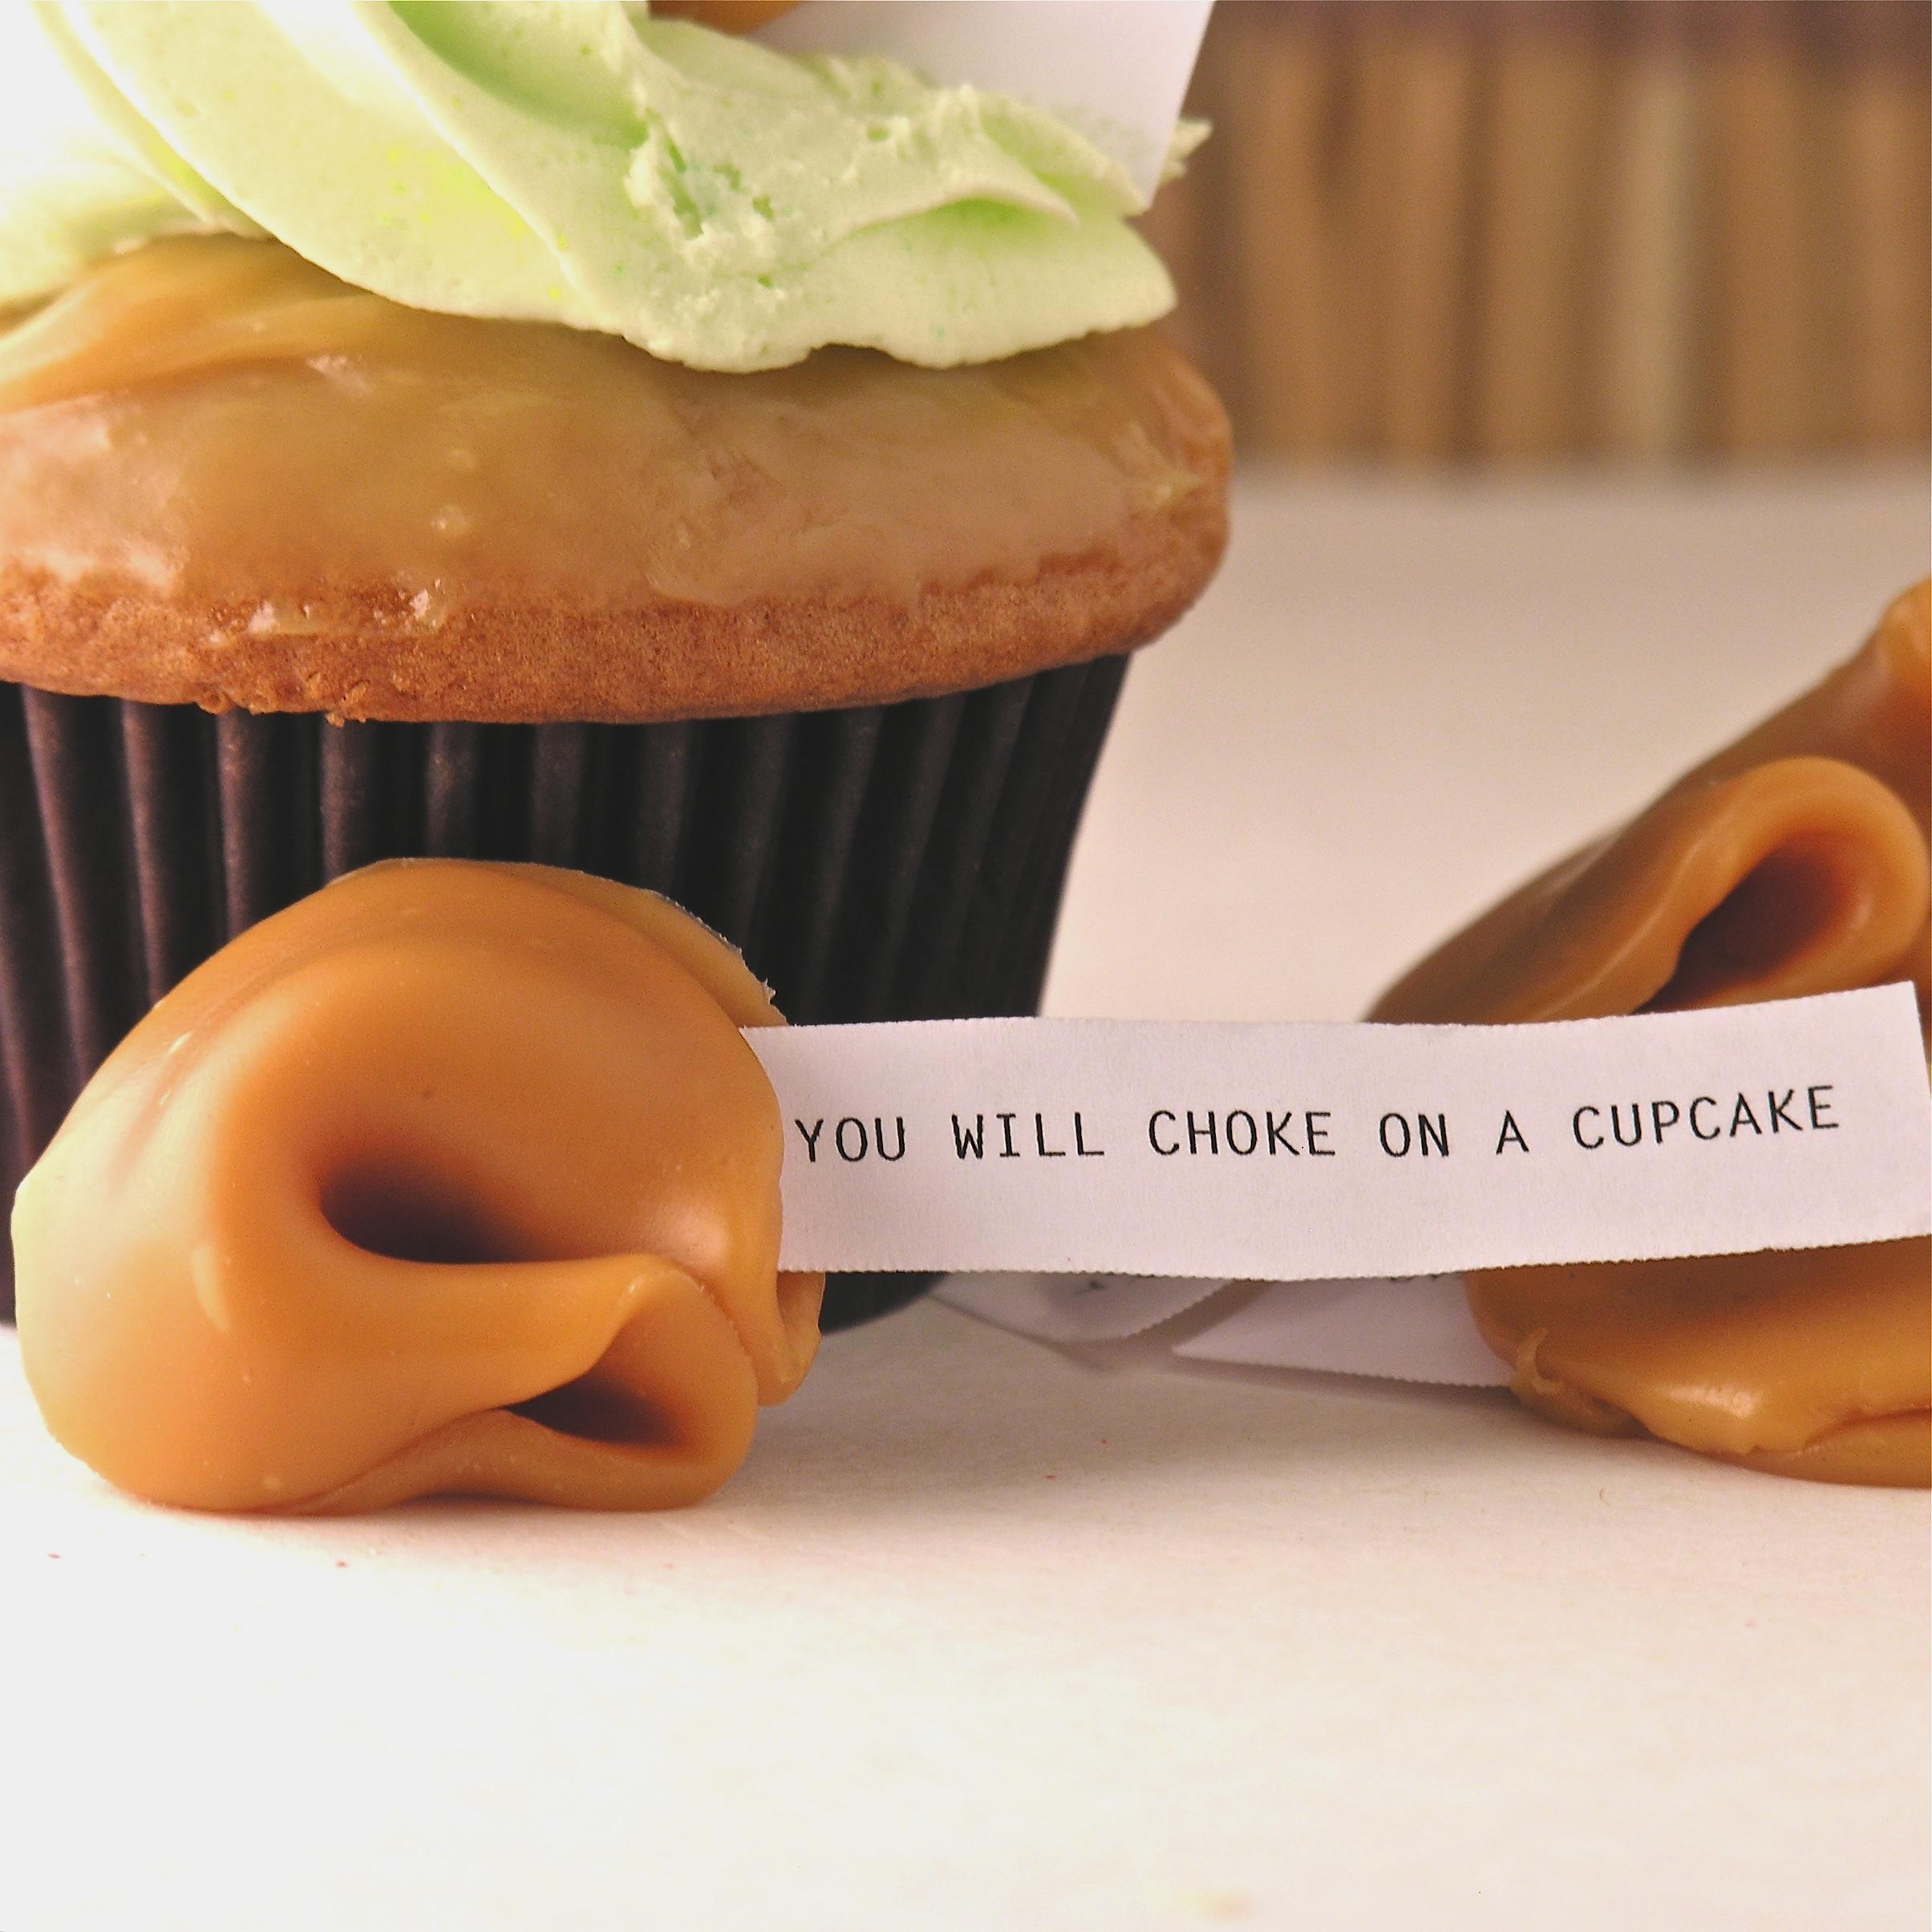 Caramel Apple Cupcakes With Halloween Misfortune Cookies